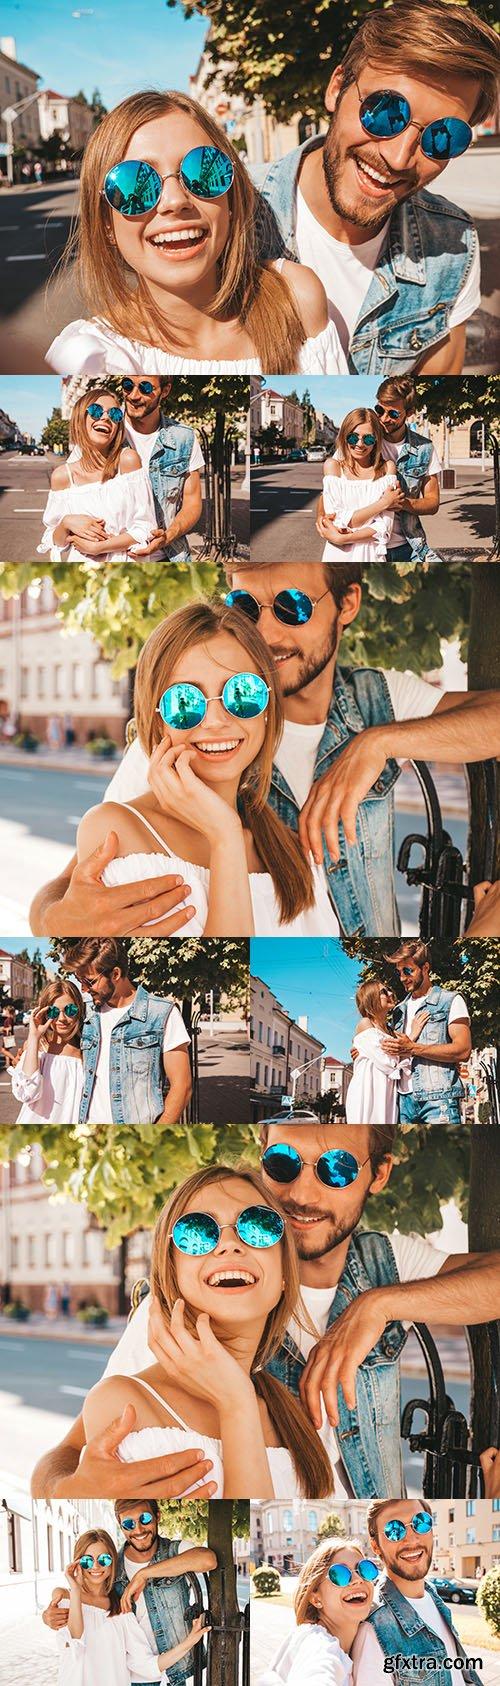 Smile romantic beautiful girl and boyfriend